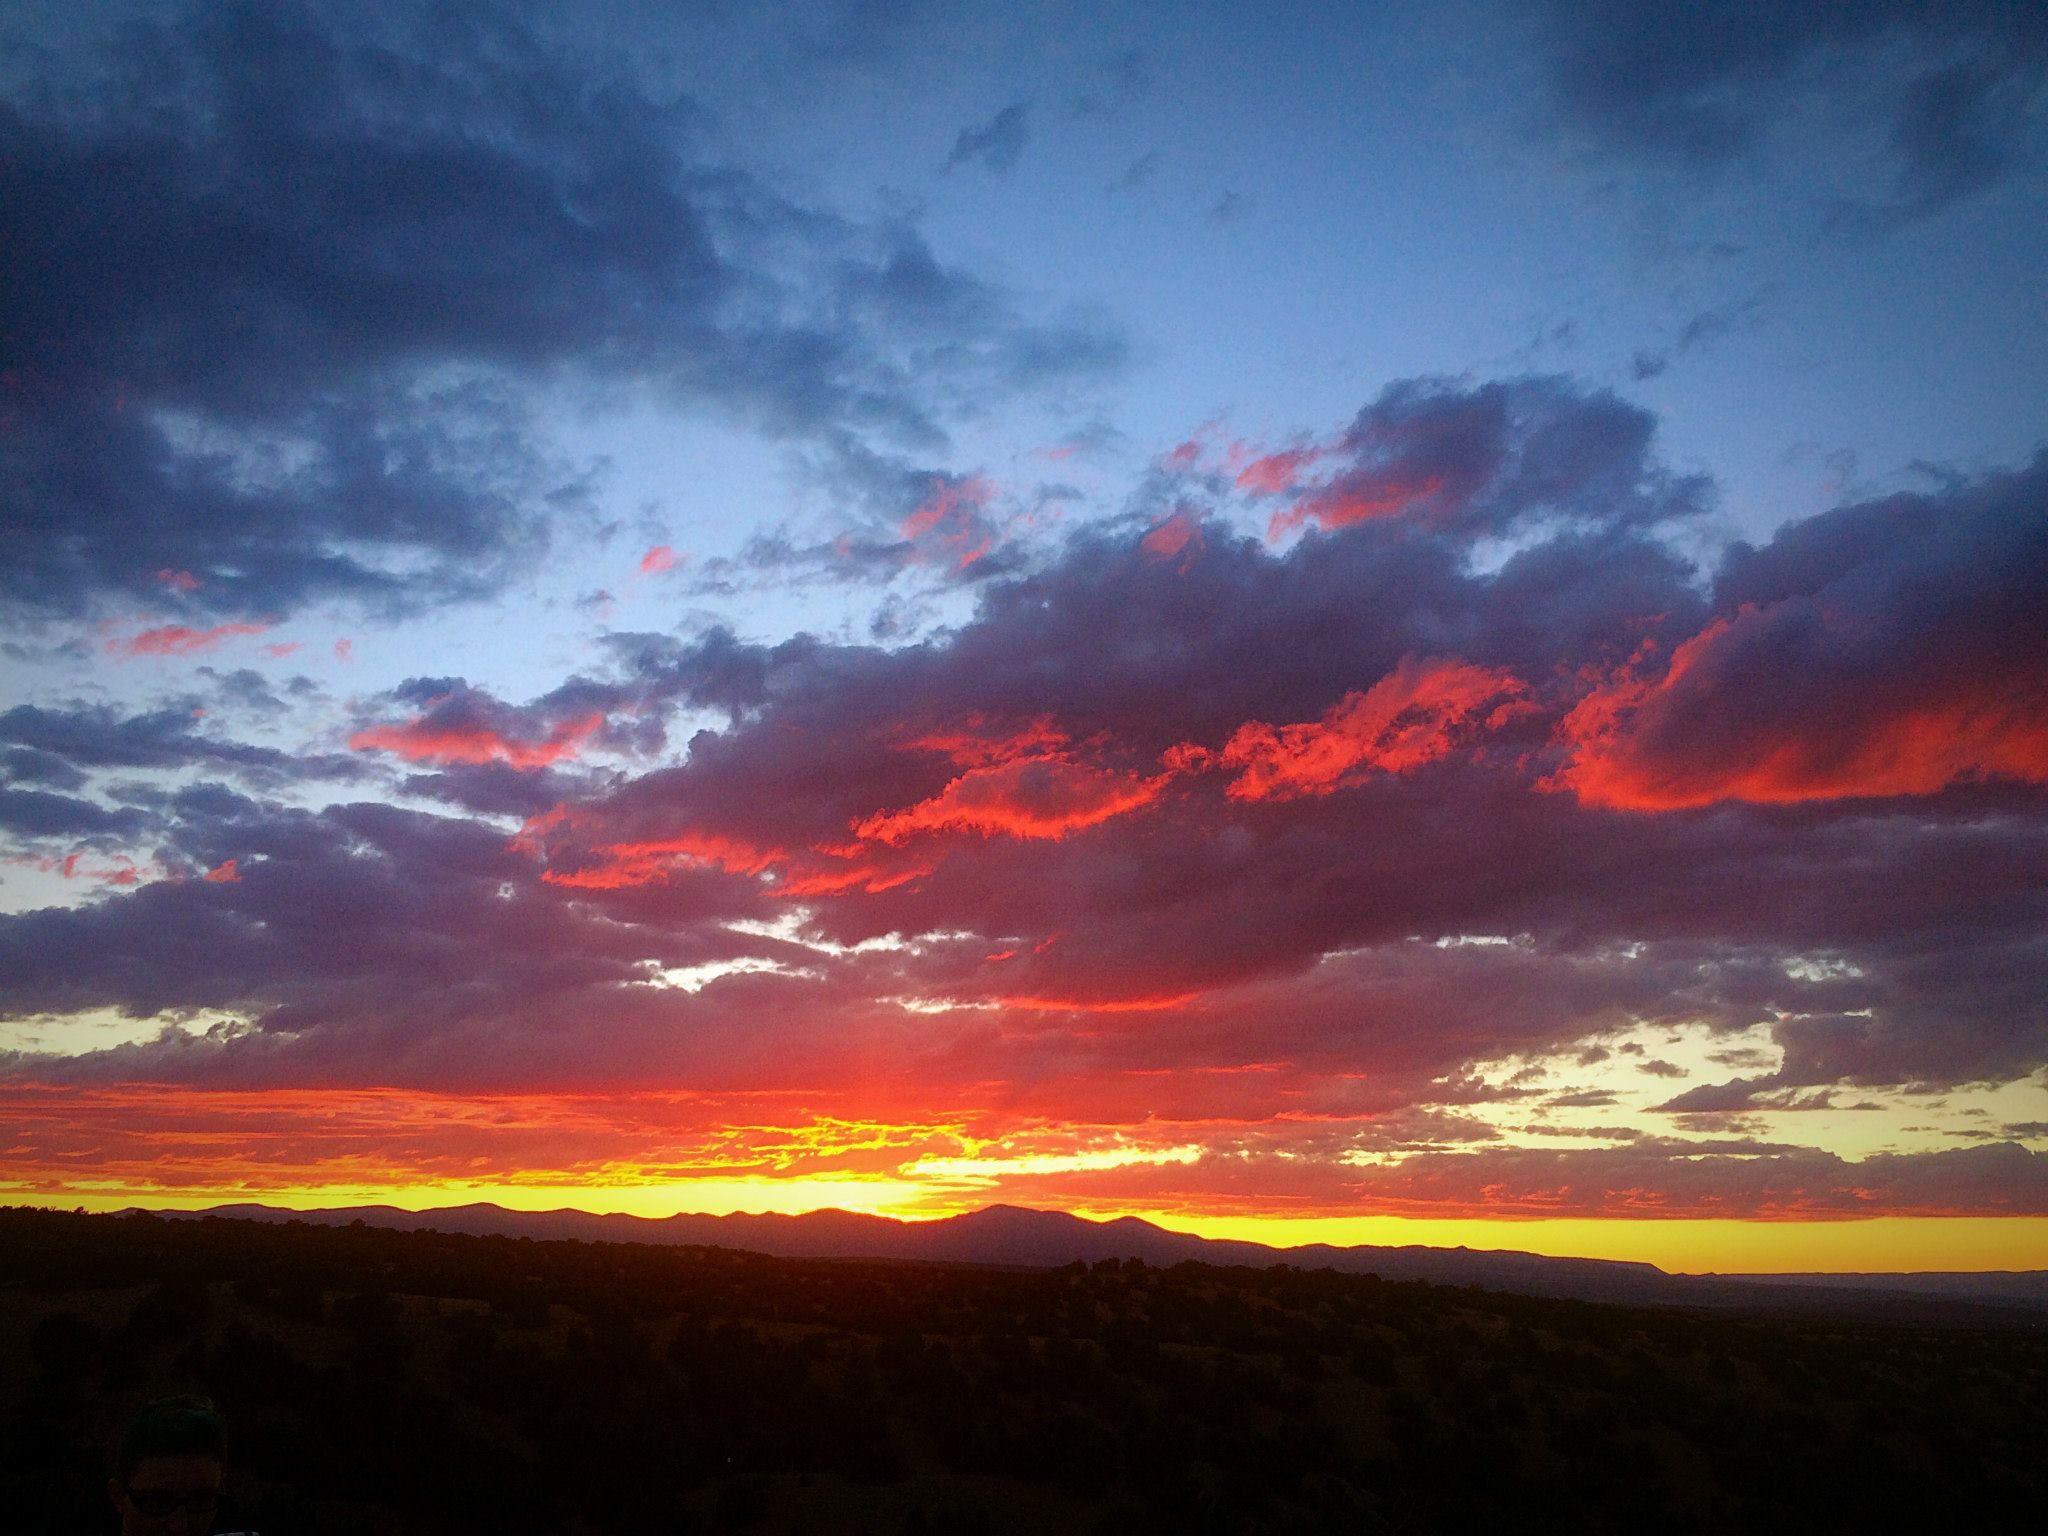 A lovely sunset! #mayarosedesigns #sunset #santafeopera #photography #santafeNM #santafe #newmexicotrue